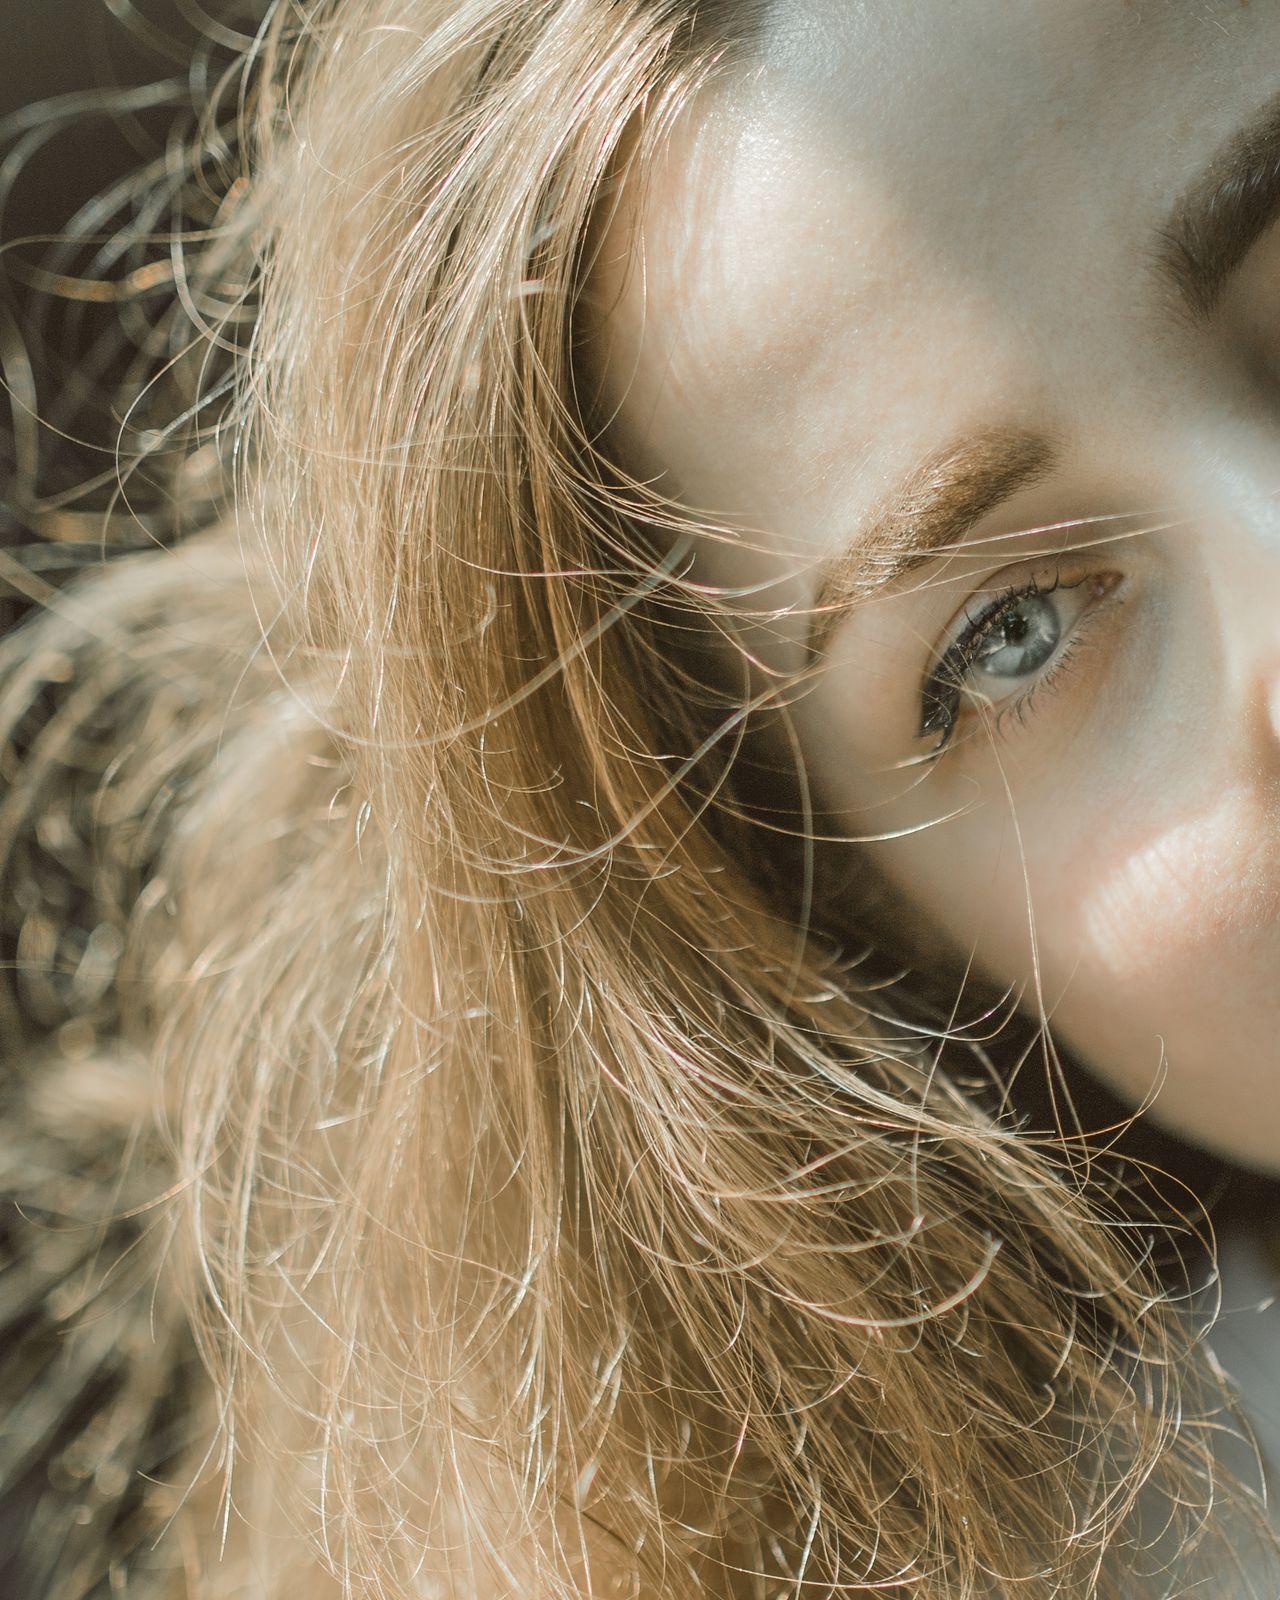 Stone cold Close-up Uniqueness Outdoors Faces Of EyeEm Women Of EyeEm Natural Light Portrait Beautiful People Portrait Of A Girl Portrait Of A Woman Portrait Photography Eye Blue Eyes Grey Eyes Fashion Portrait Blond Golden Hair  Hair